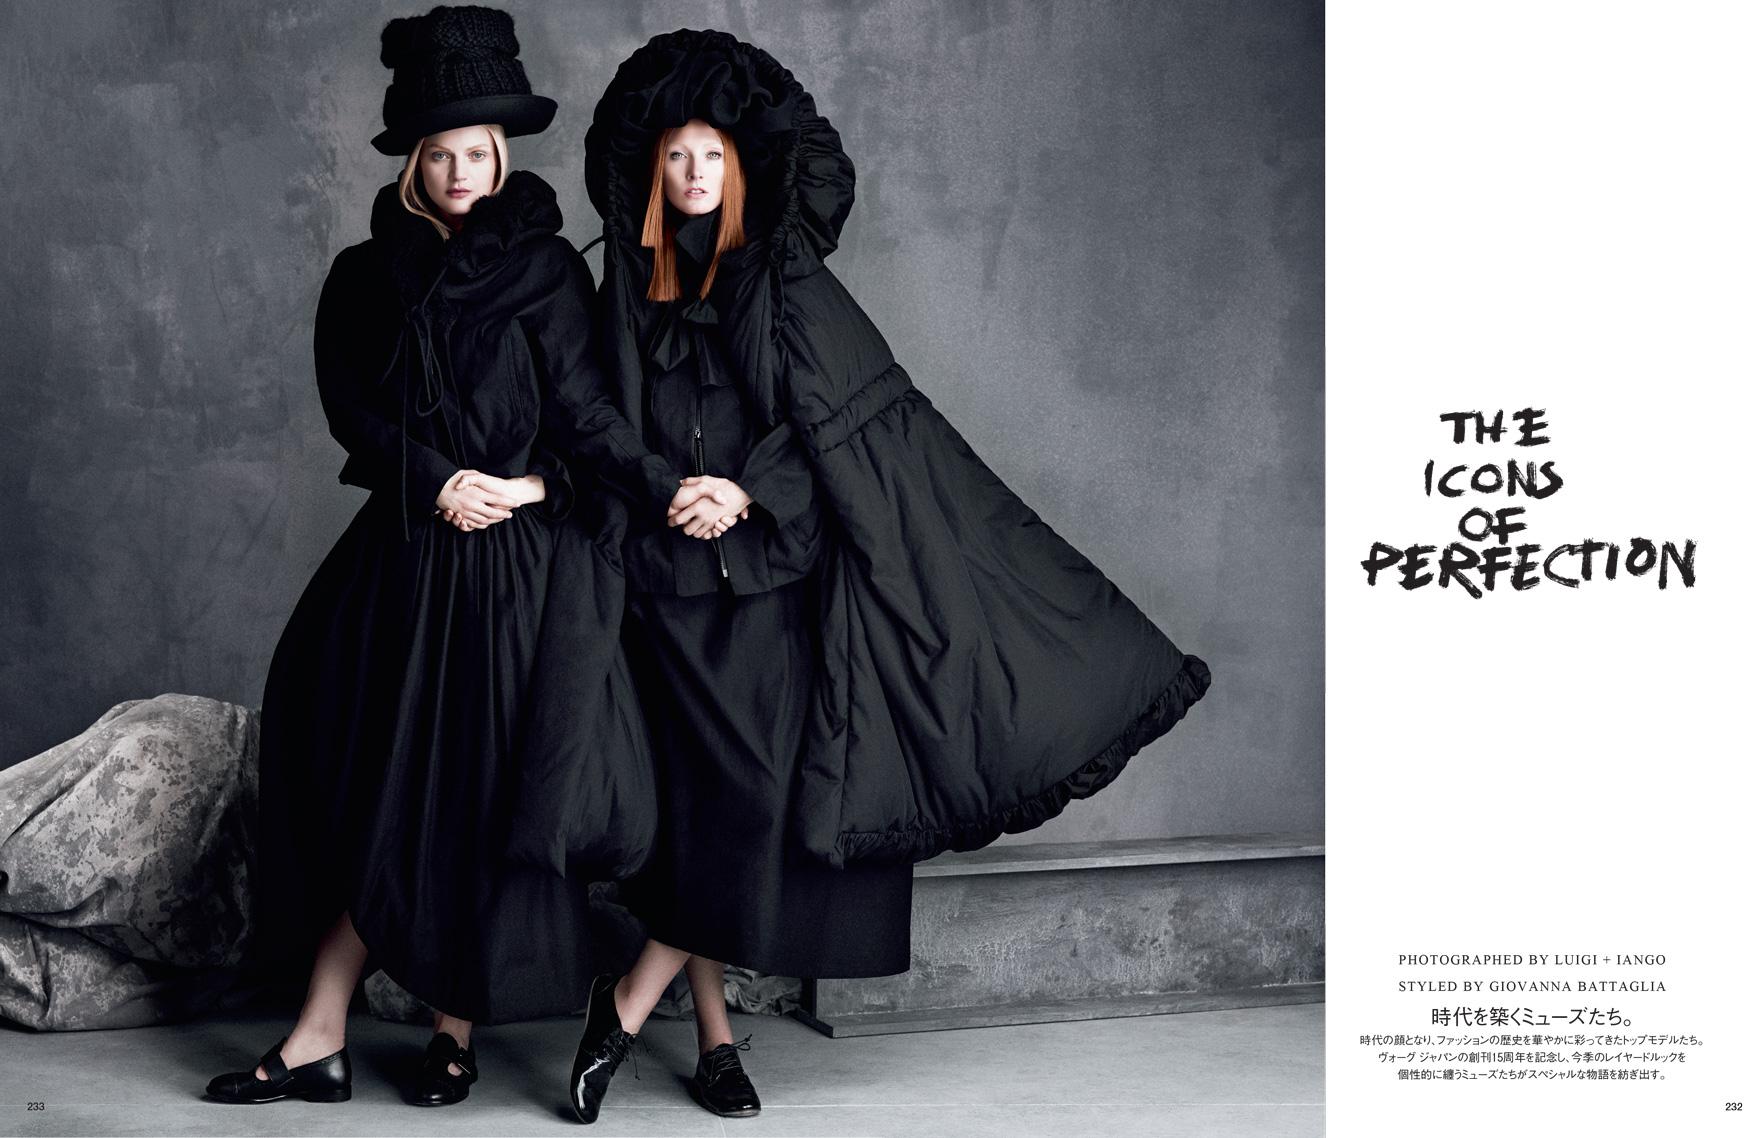 Giovanna-Battaglia-The-Icons-Of-Perfections-Vogue-Japan-15th-Anniversary-Issue-Luigi-Iango-1.jpg